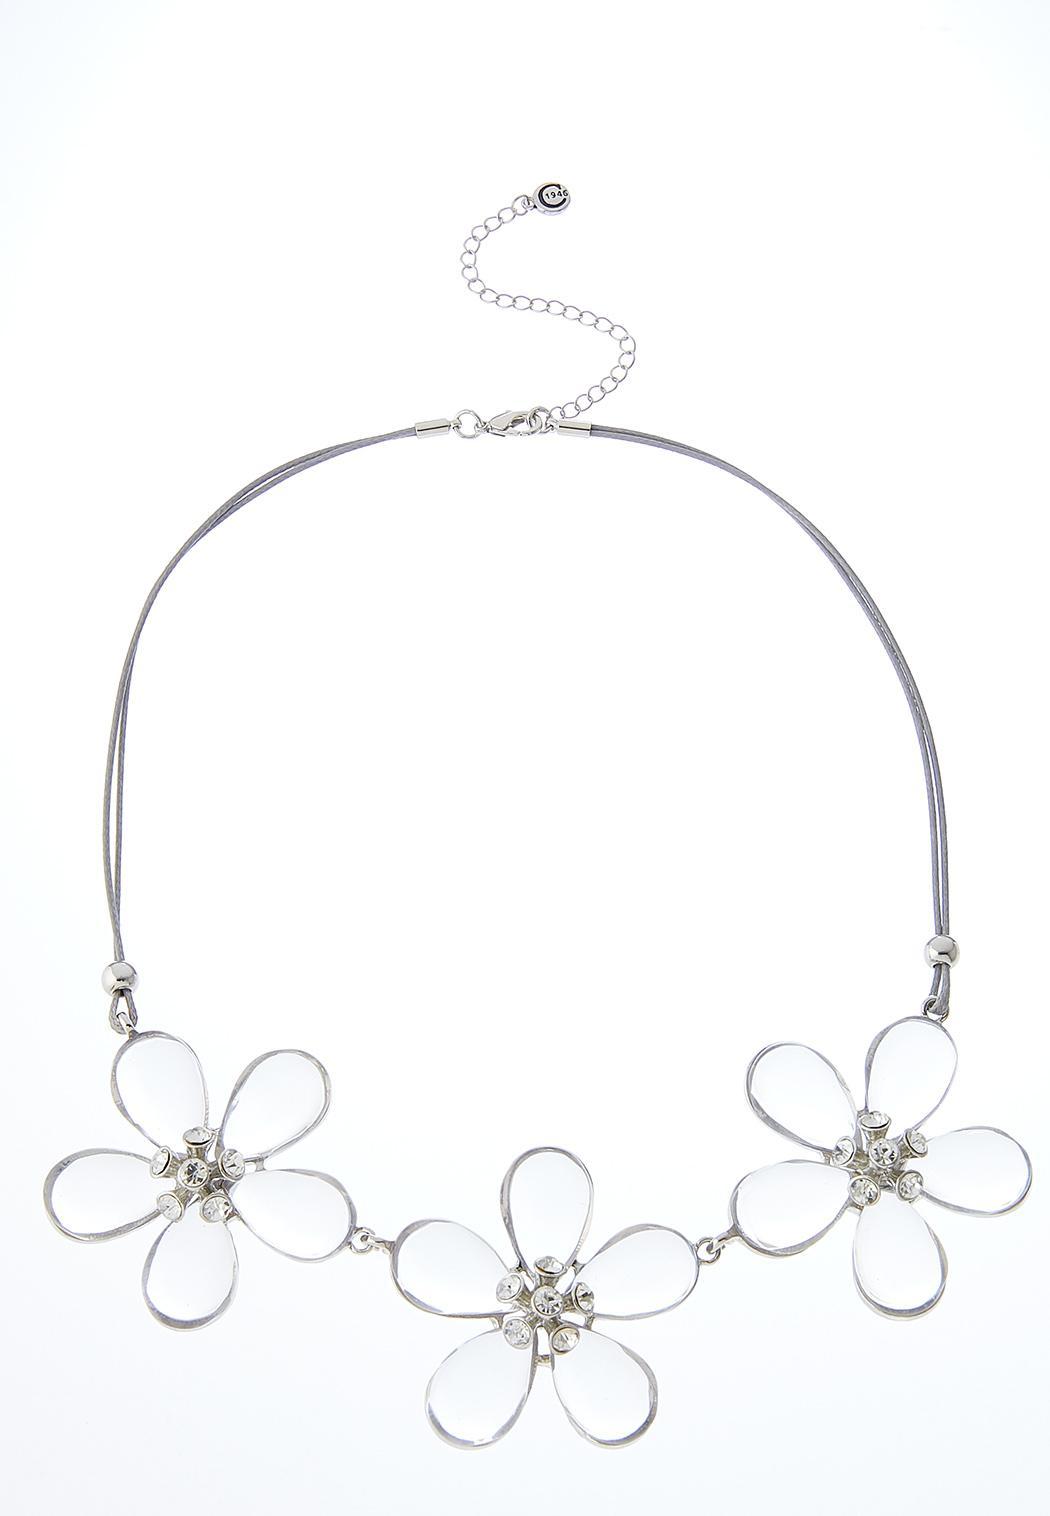 Triple Flower Cord Necklace